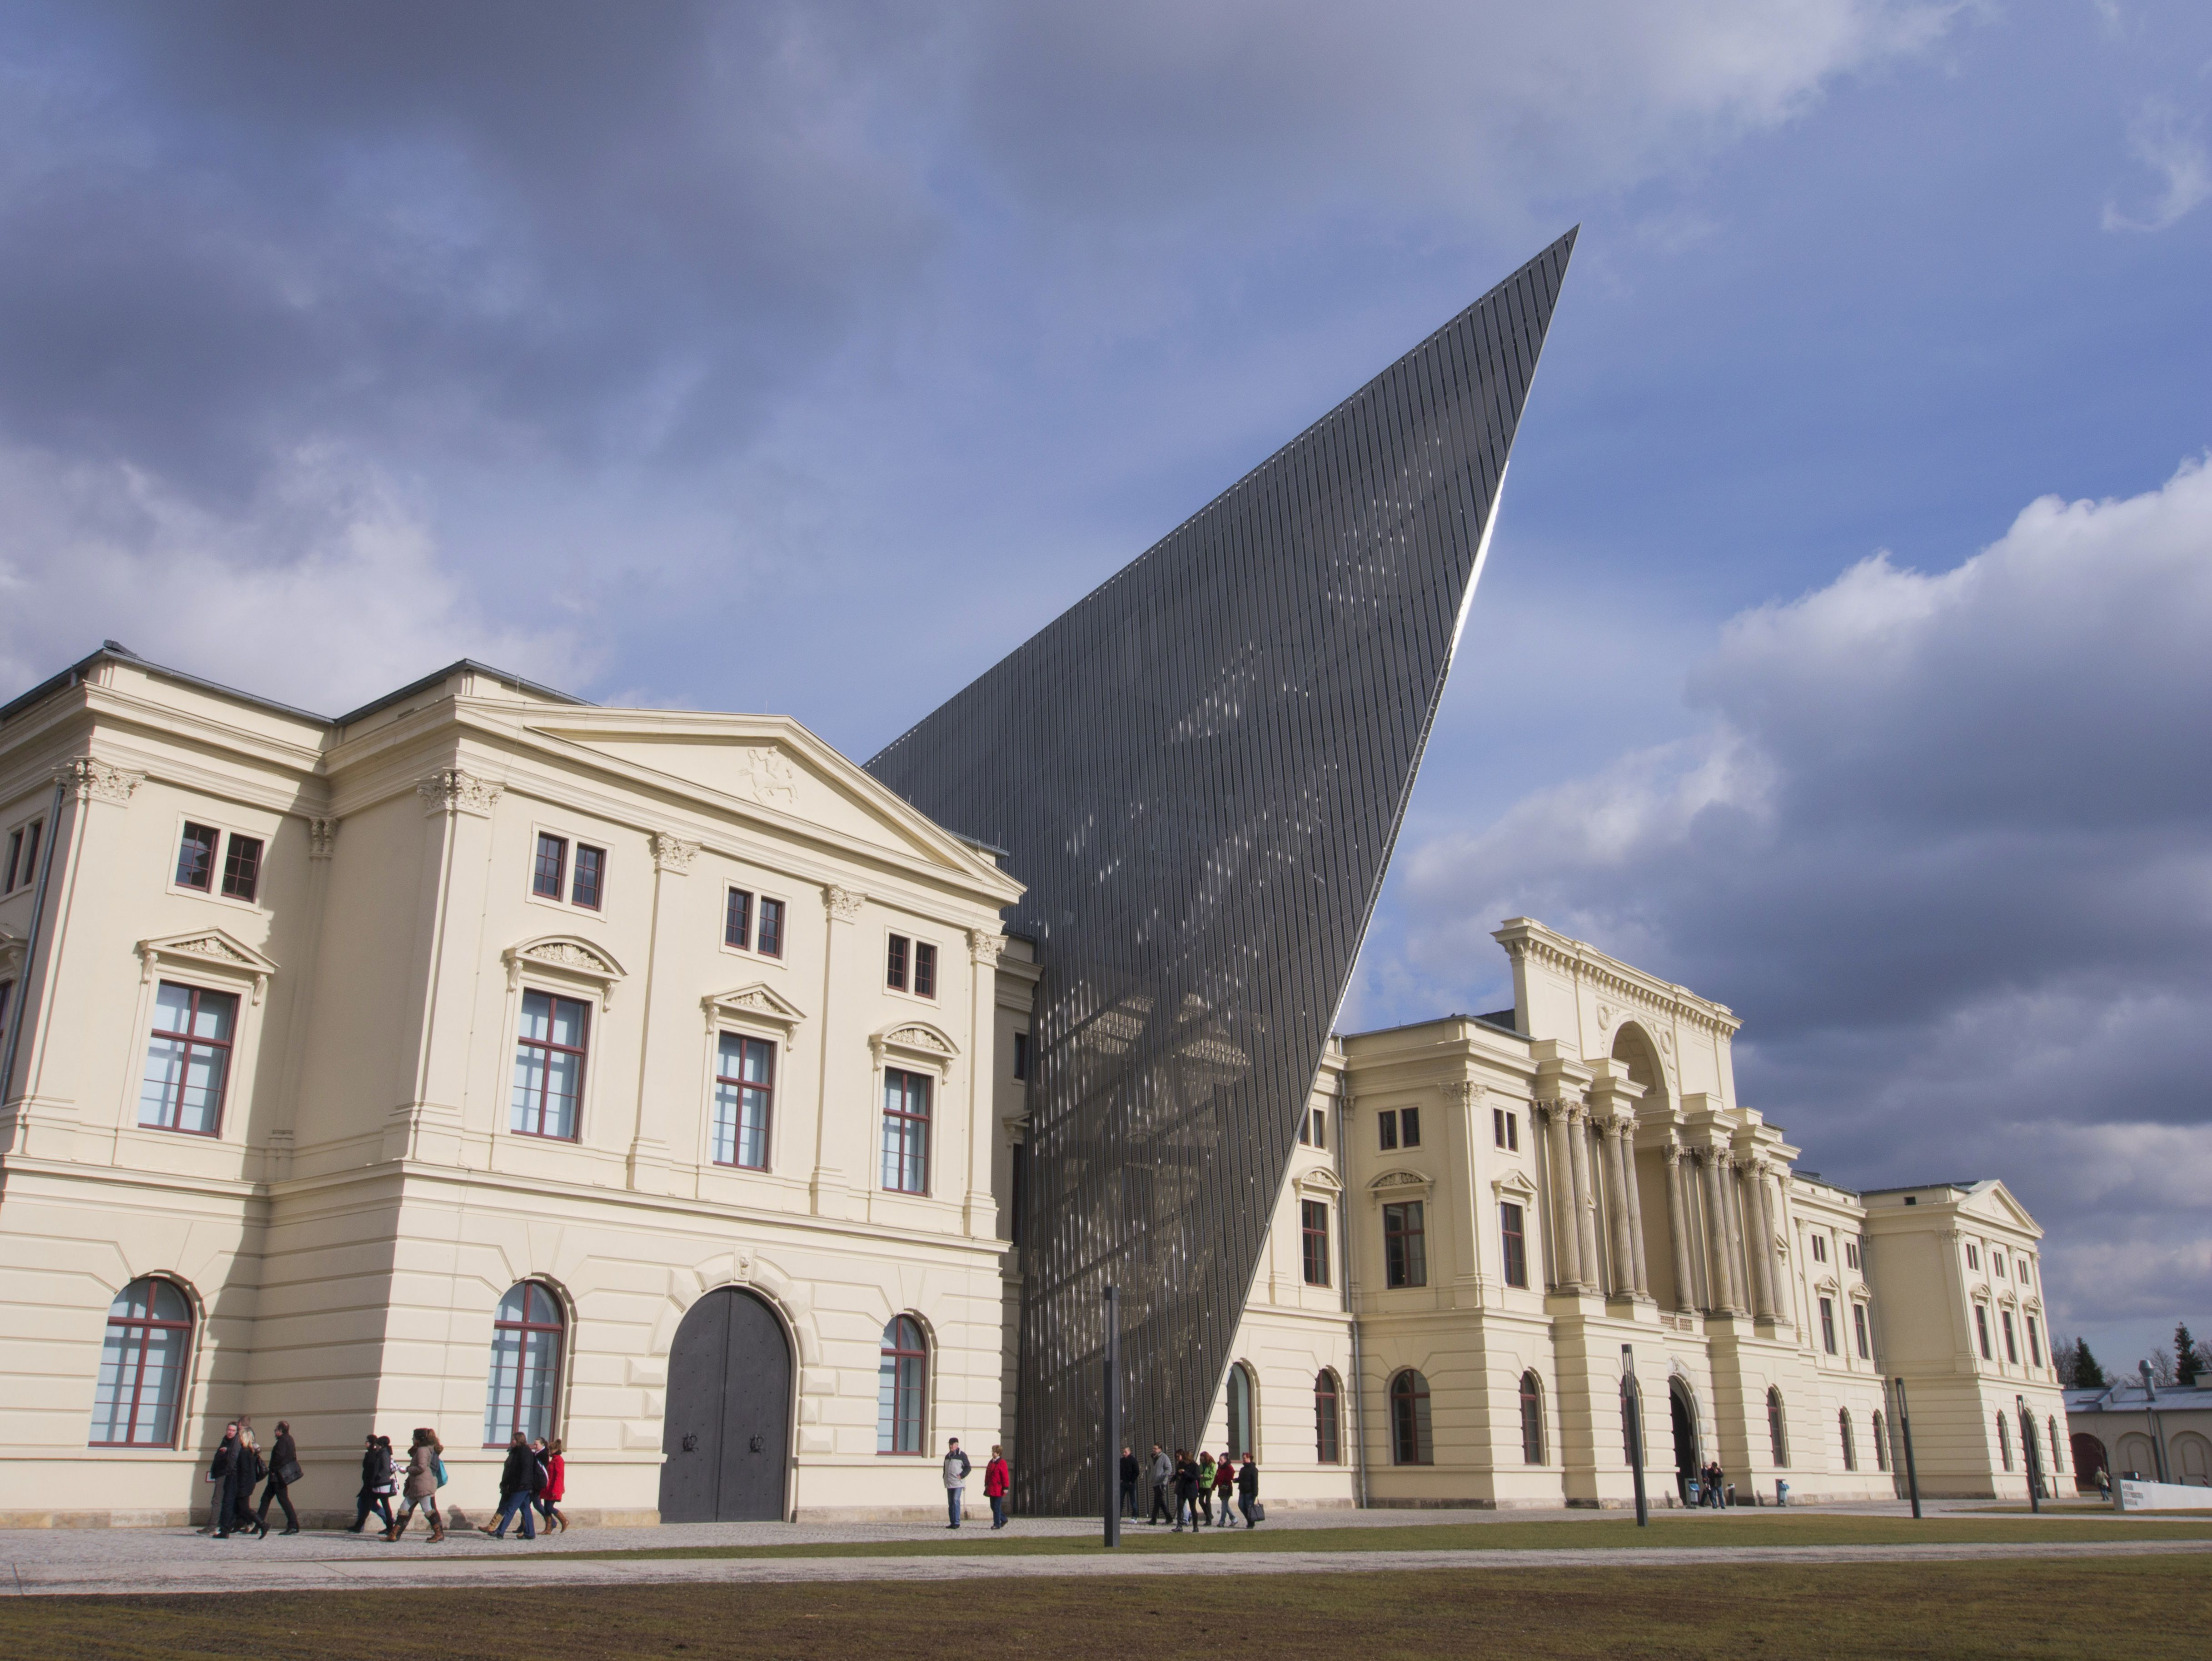 Top Ten Things To Do In Dresden